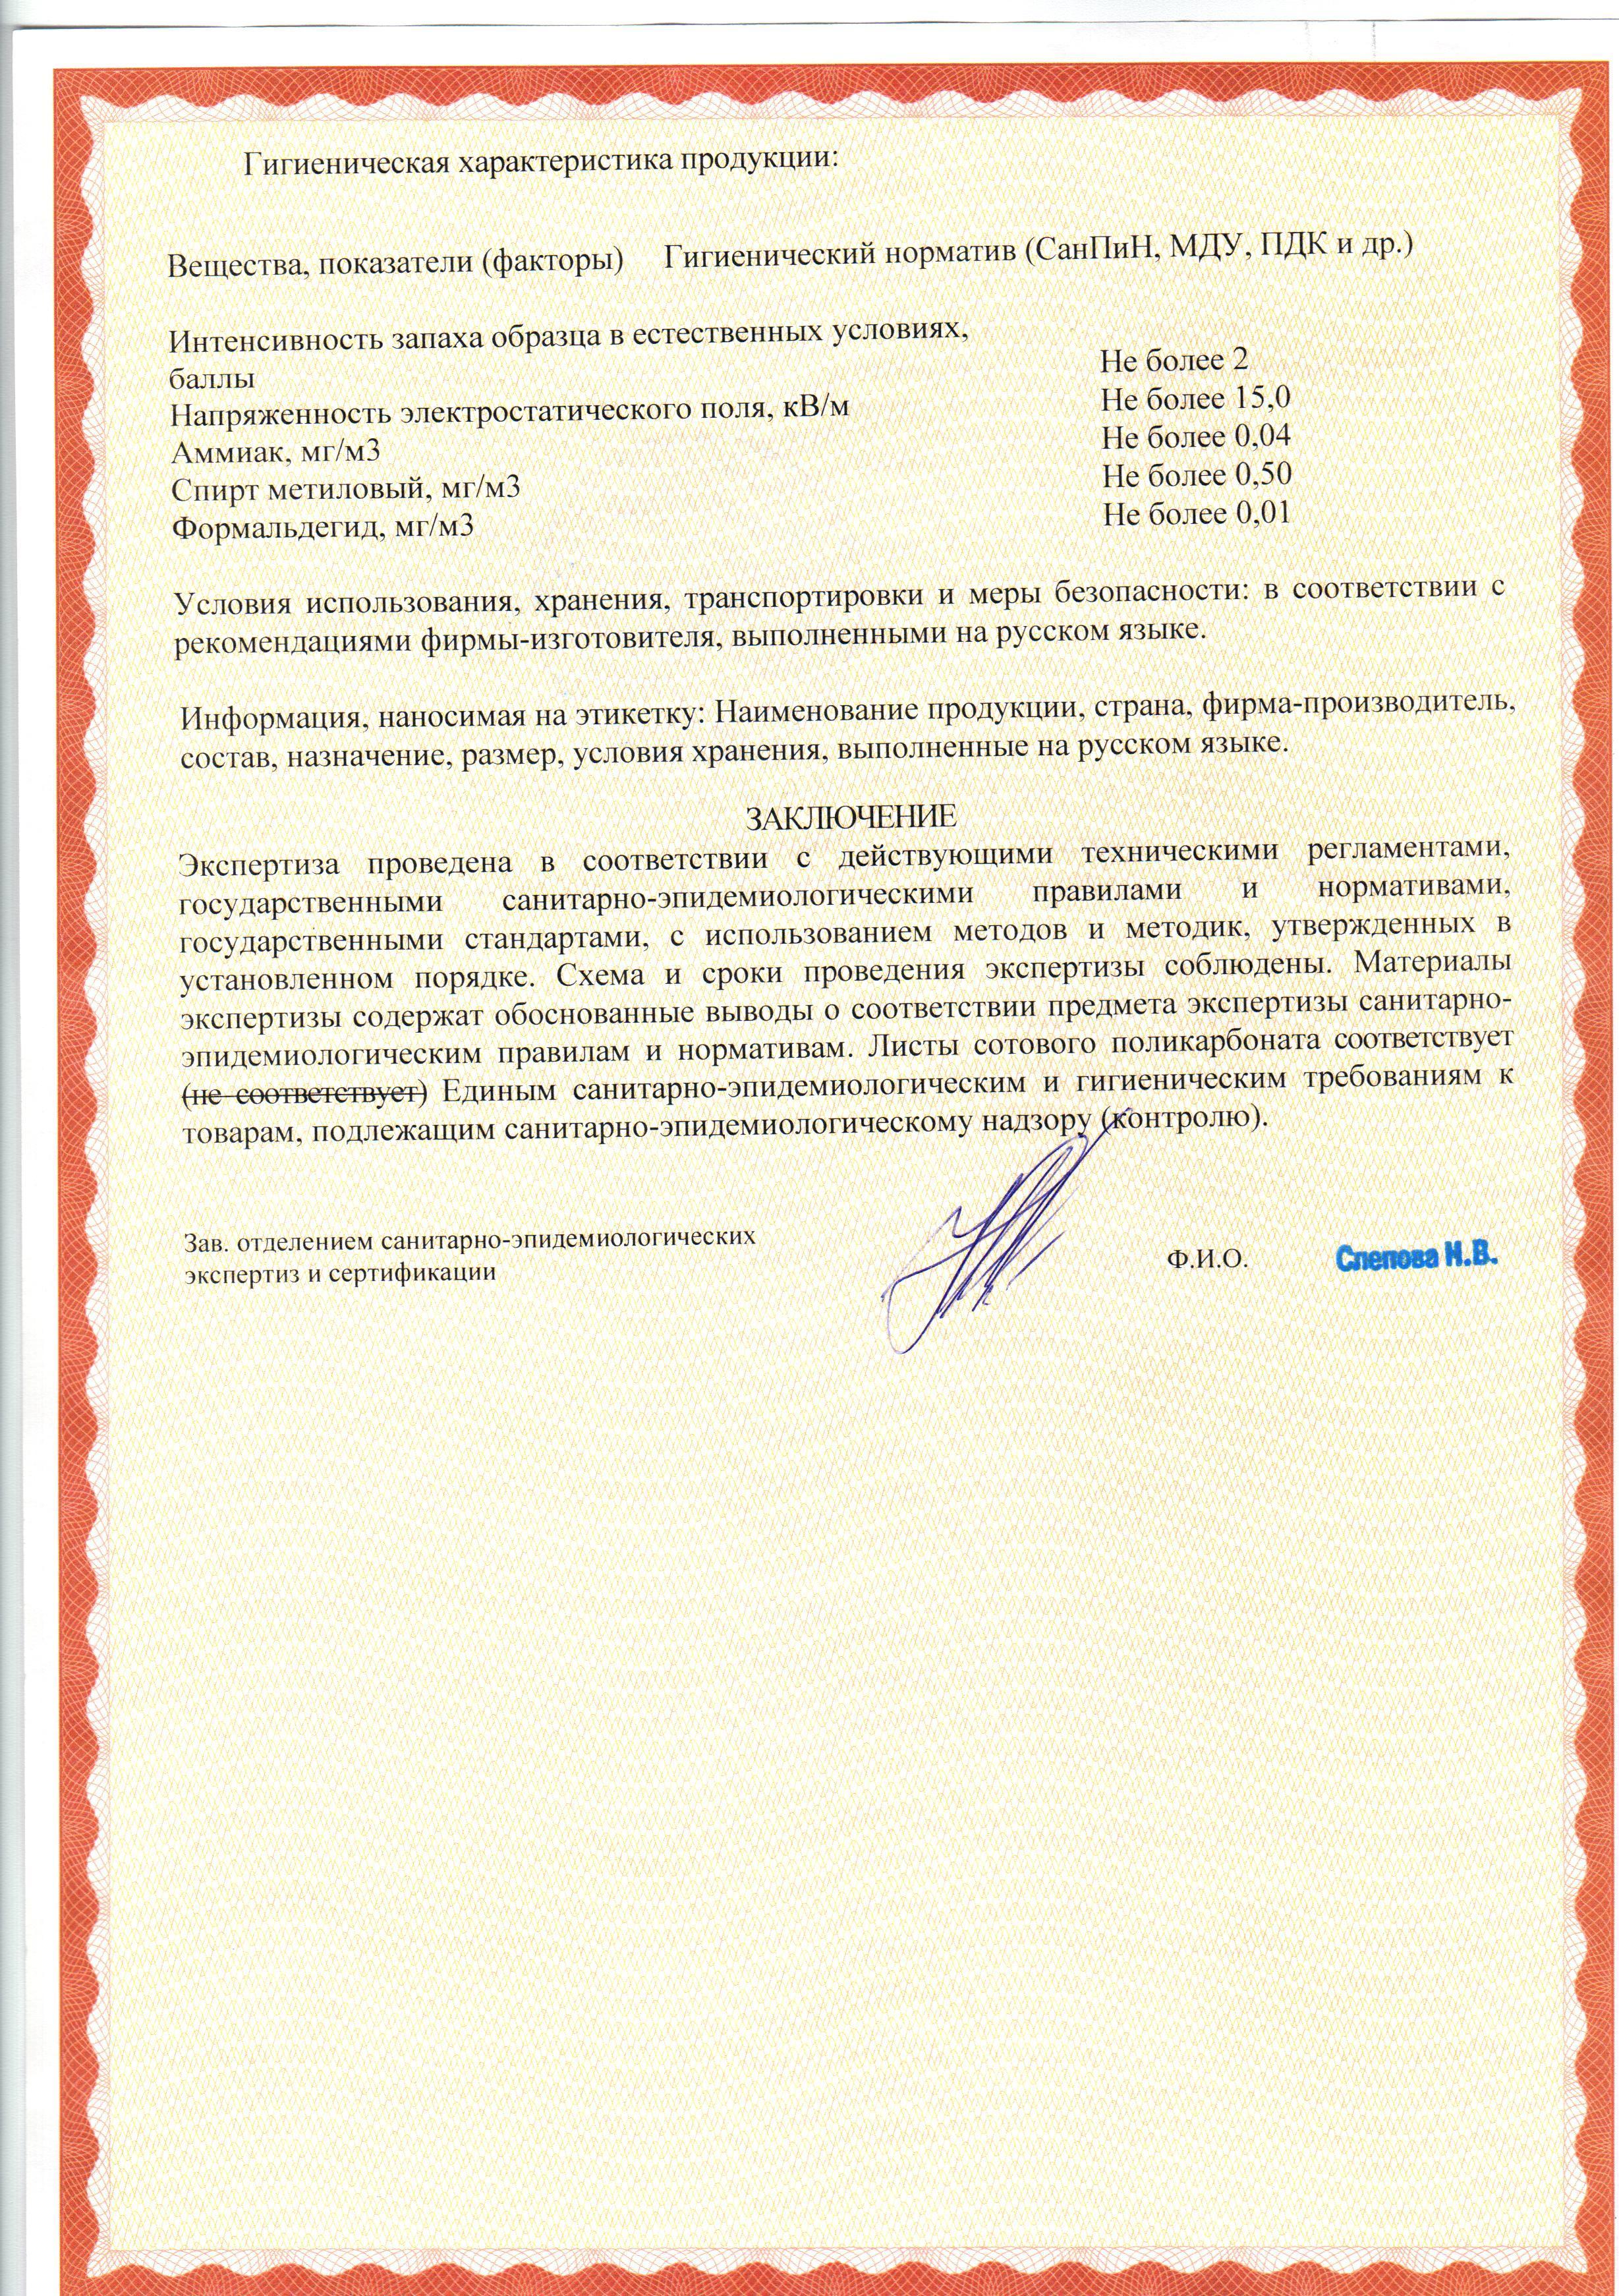 http://ecopoli.ru/images/upload/экспертное%20заключение%202.jpg